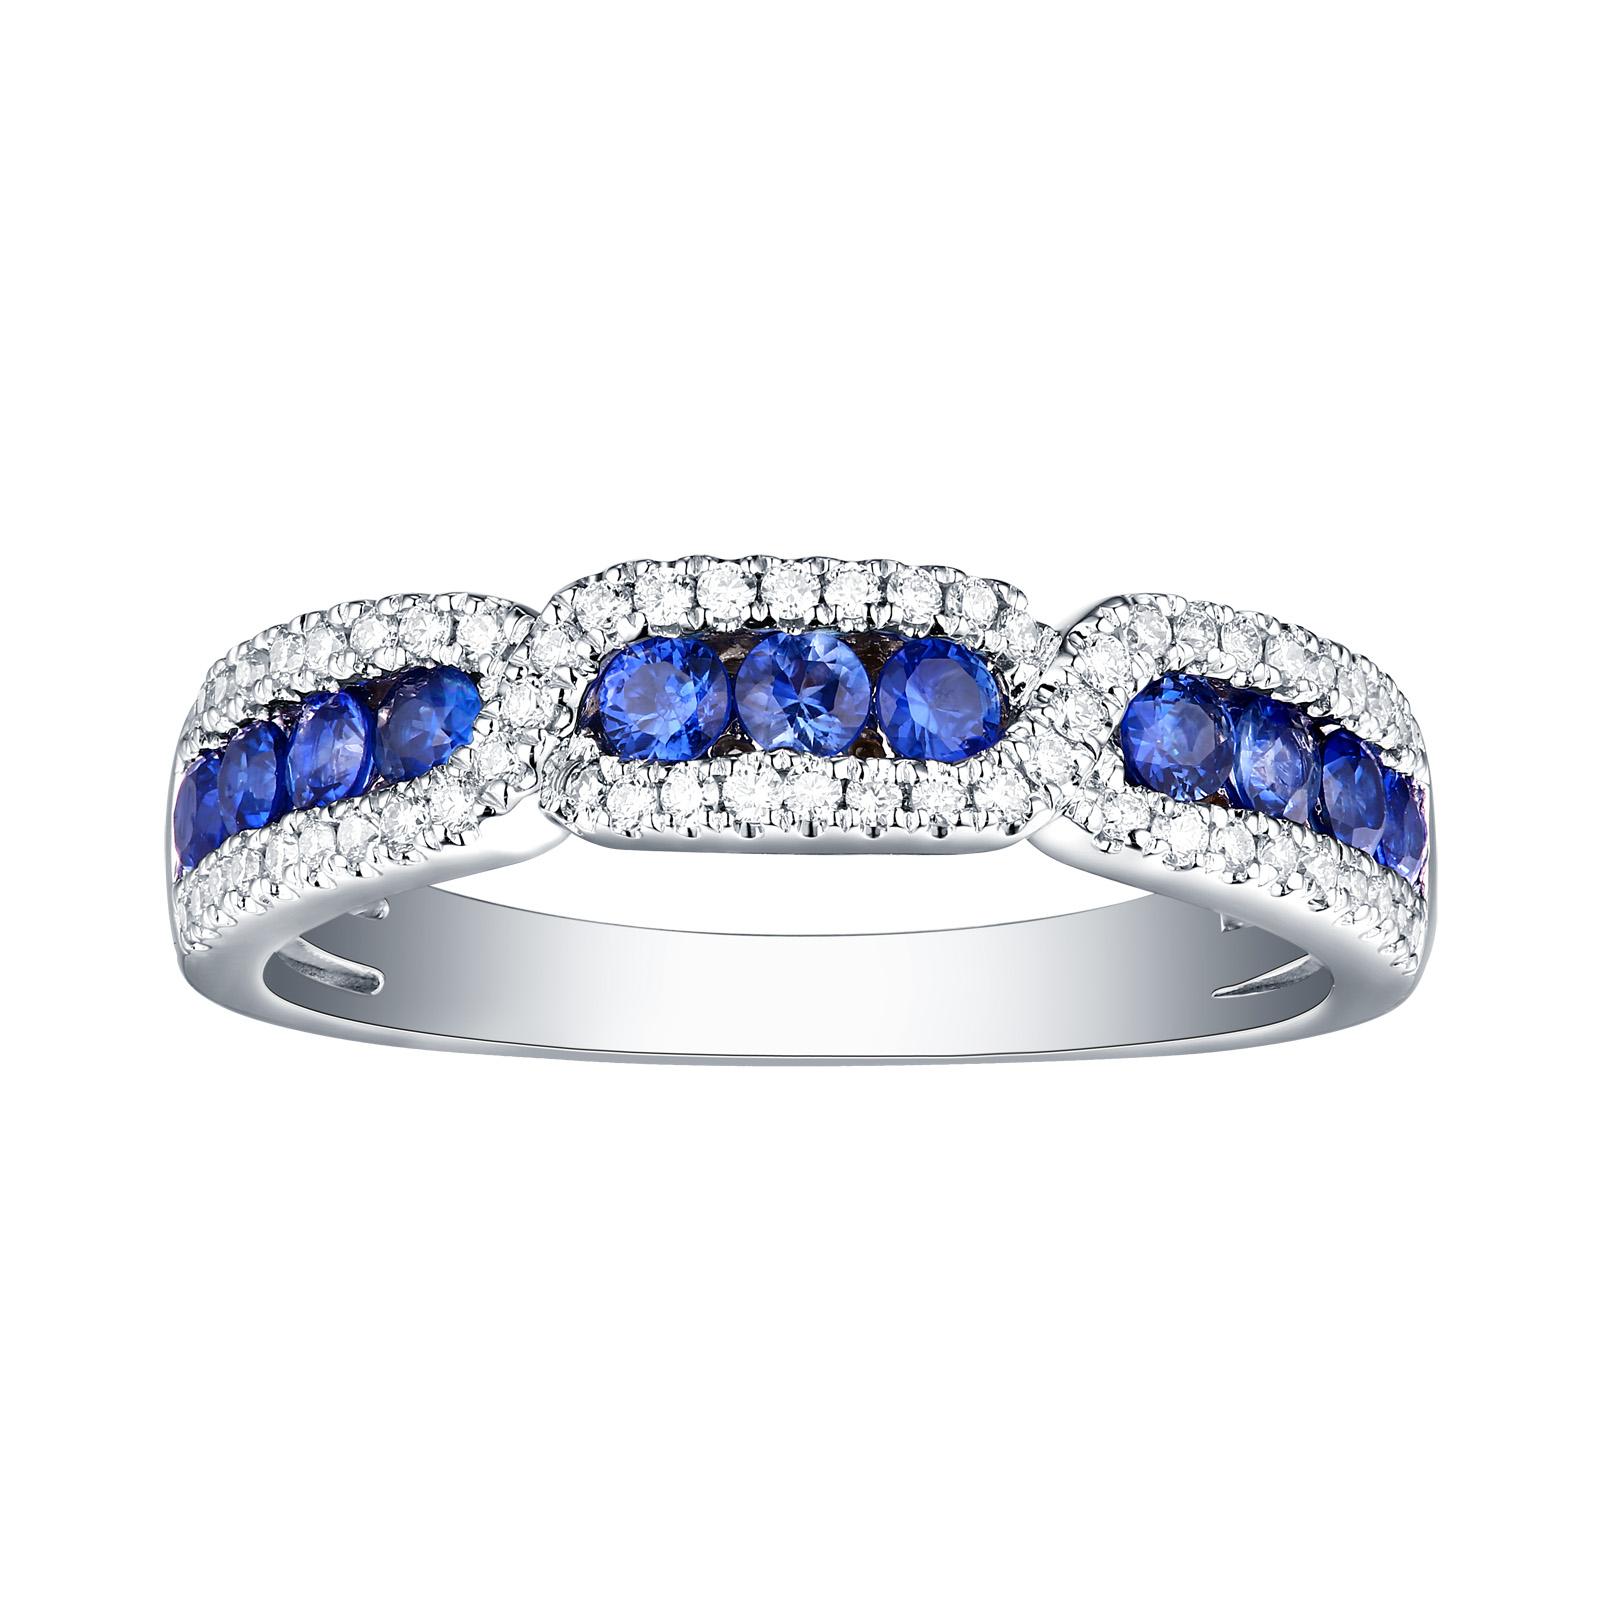 R22402BSA – 14K White Gold Blue Sapphire and Diamond Ring, 0.74 TCW